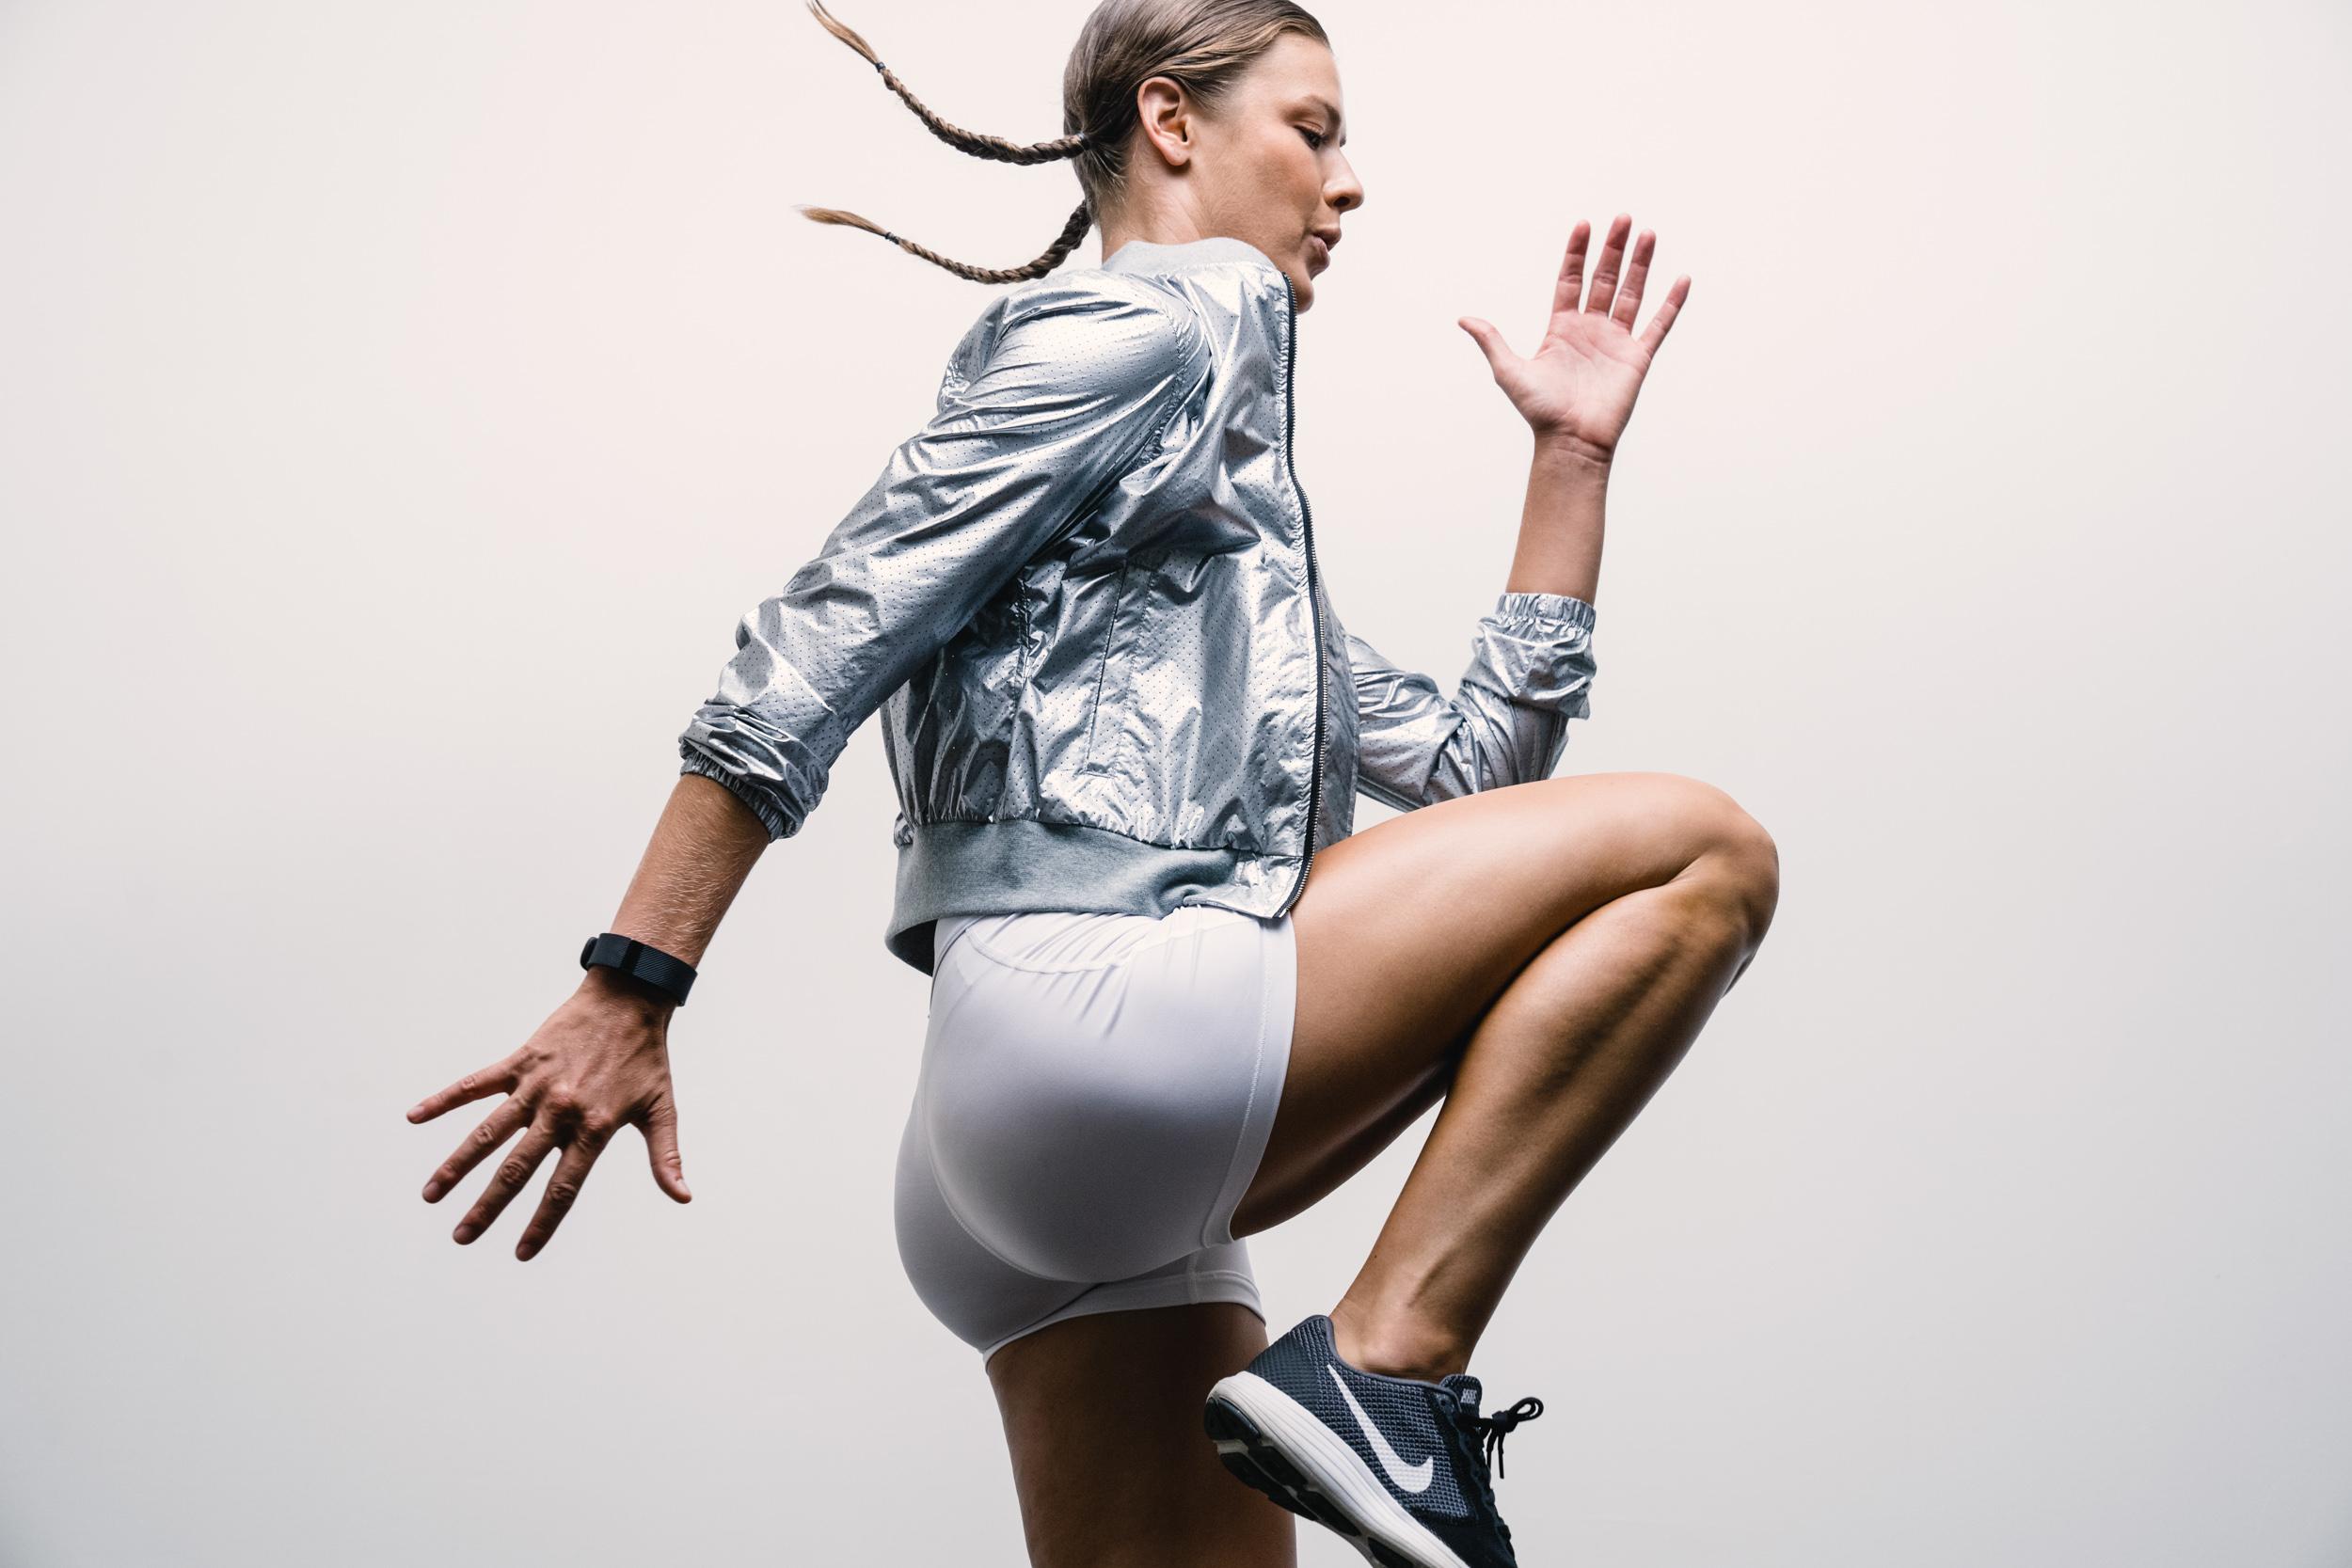 Objktv_SQ_OBJKTV_MaxRes_Fitness_Nike+Studio+Shoot7856.jpg